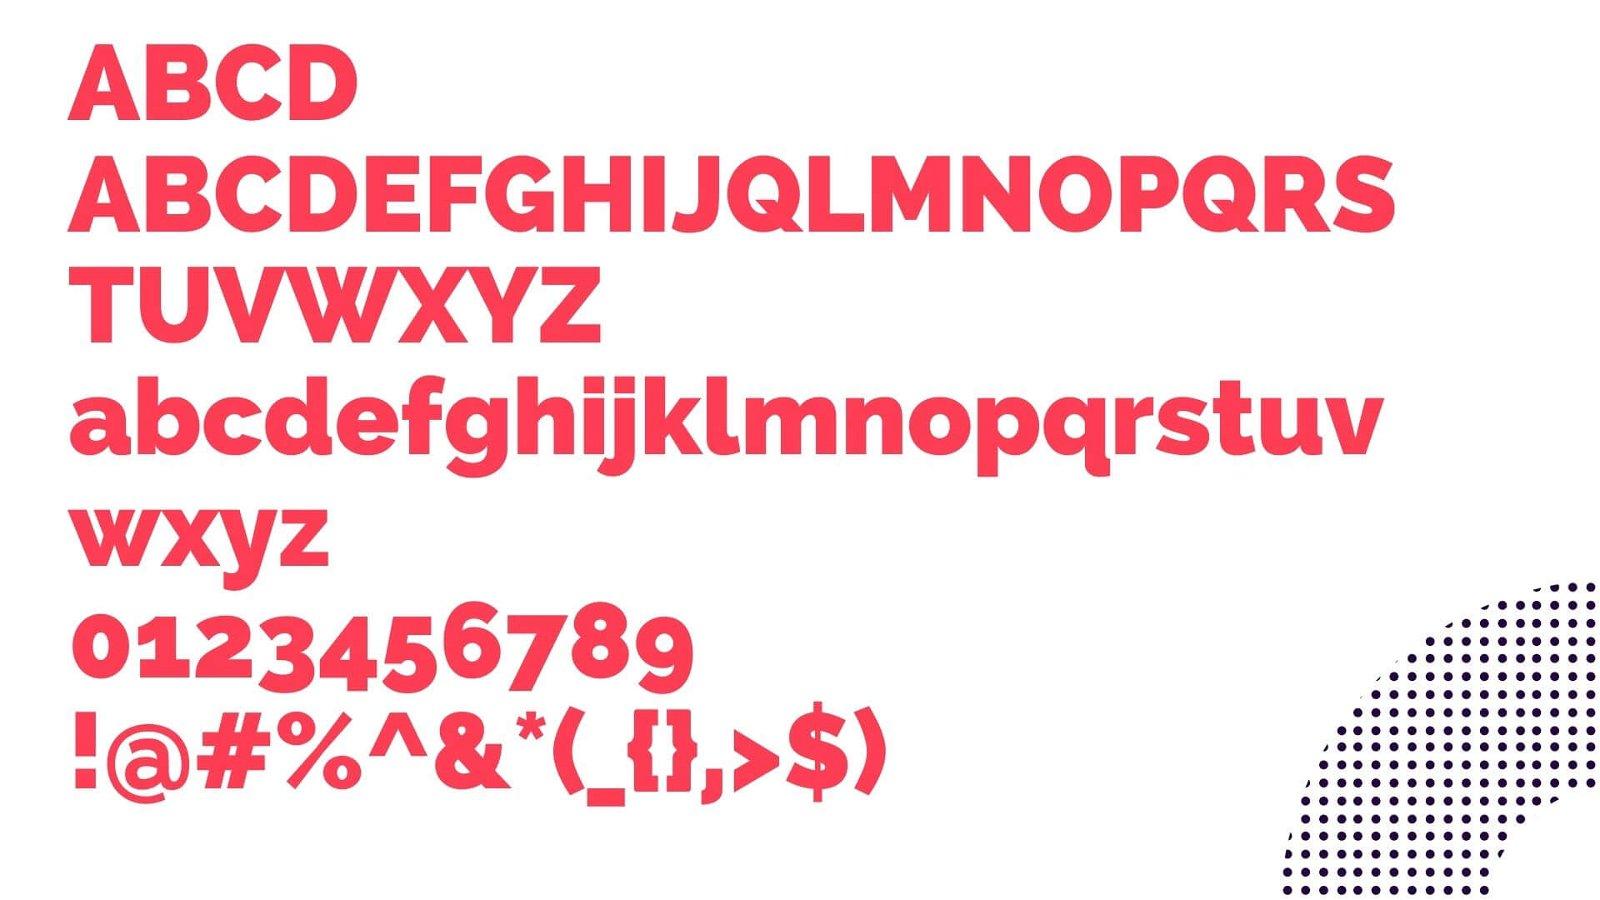 Raleway Font View - Raleway Font Family Free Download